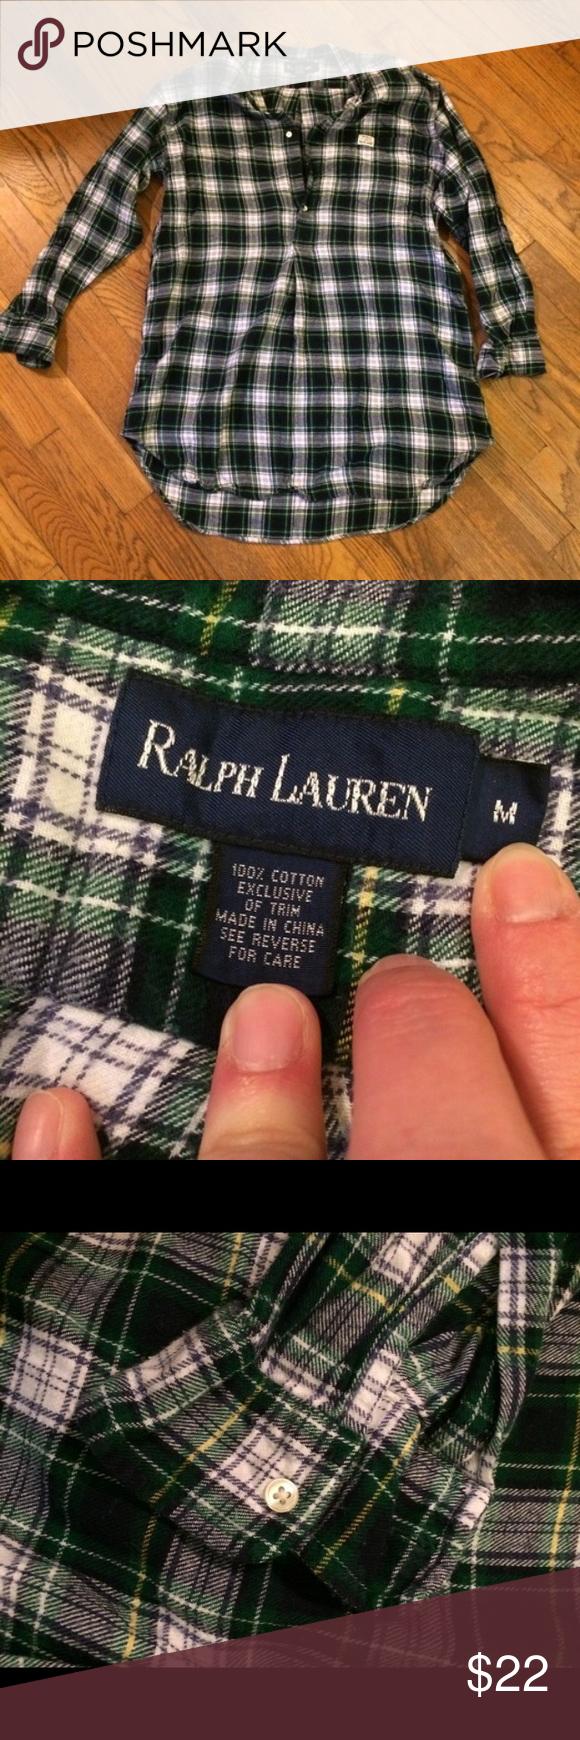 Ralph Lauren plaid pullover tunic In perfect condition. Size medium. Ralph Lauren Tops Tunics